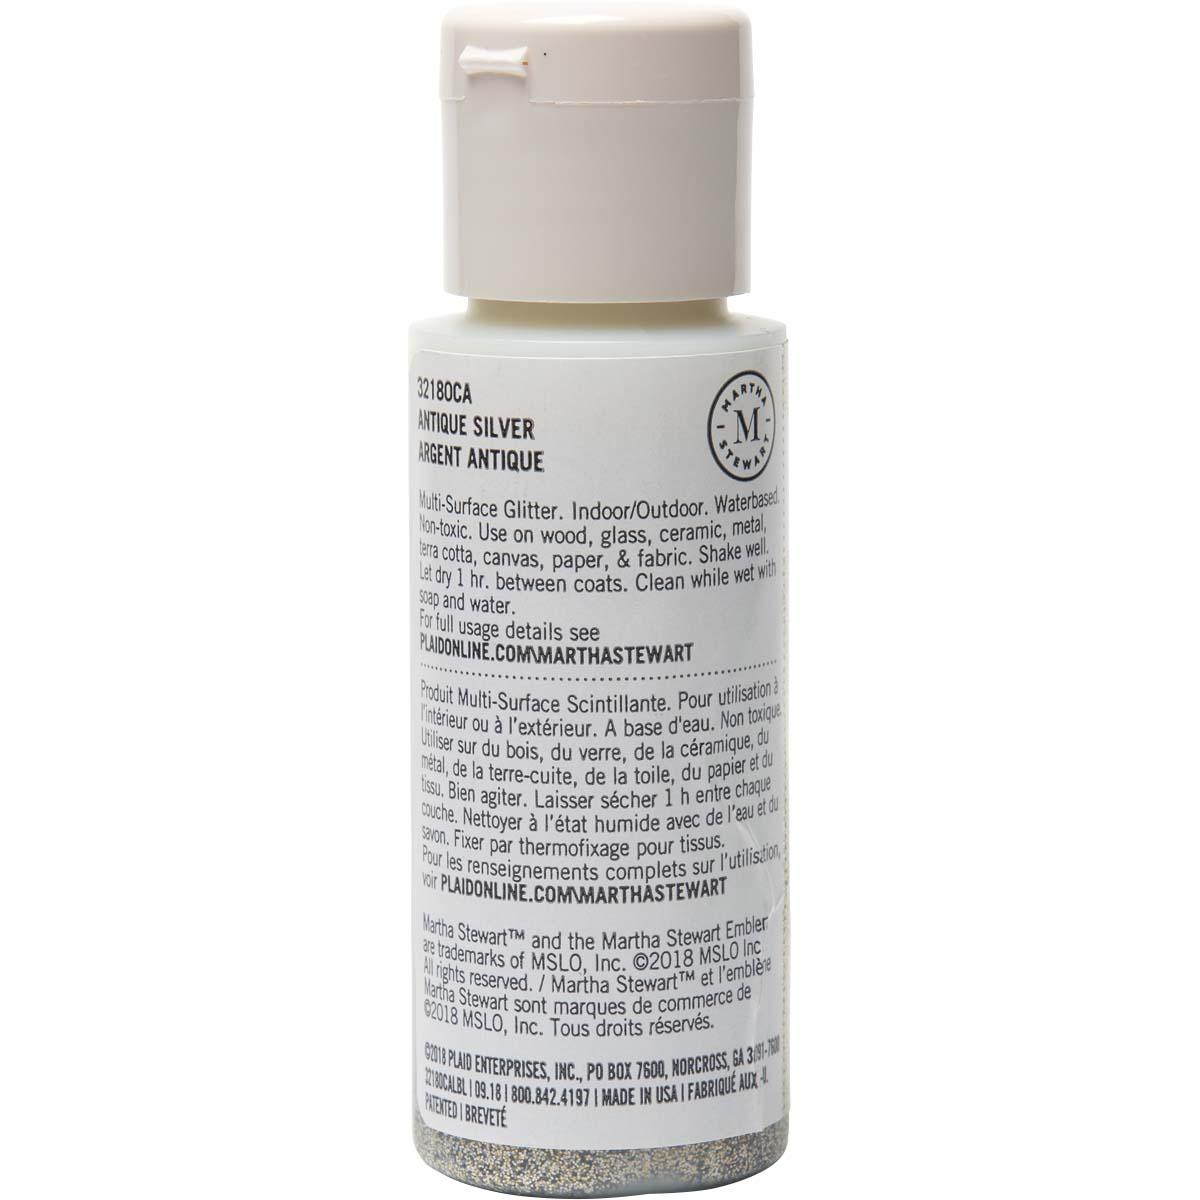 Martha Stewart ® Multi-Surface Glitter Acrylic Craft Paint - Antique Silver, 2 oz. - 32180CA